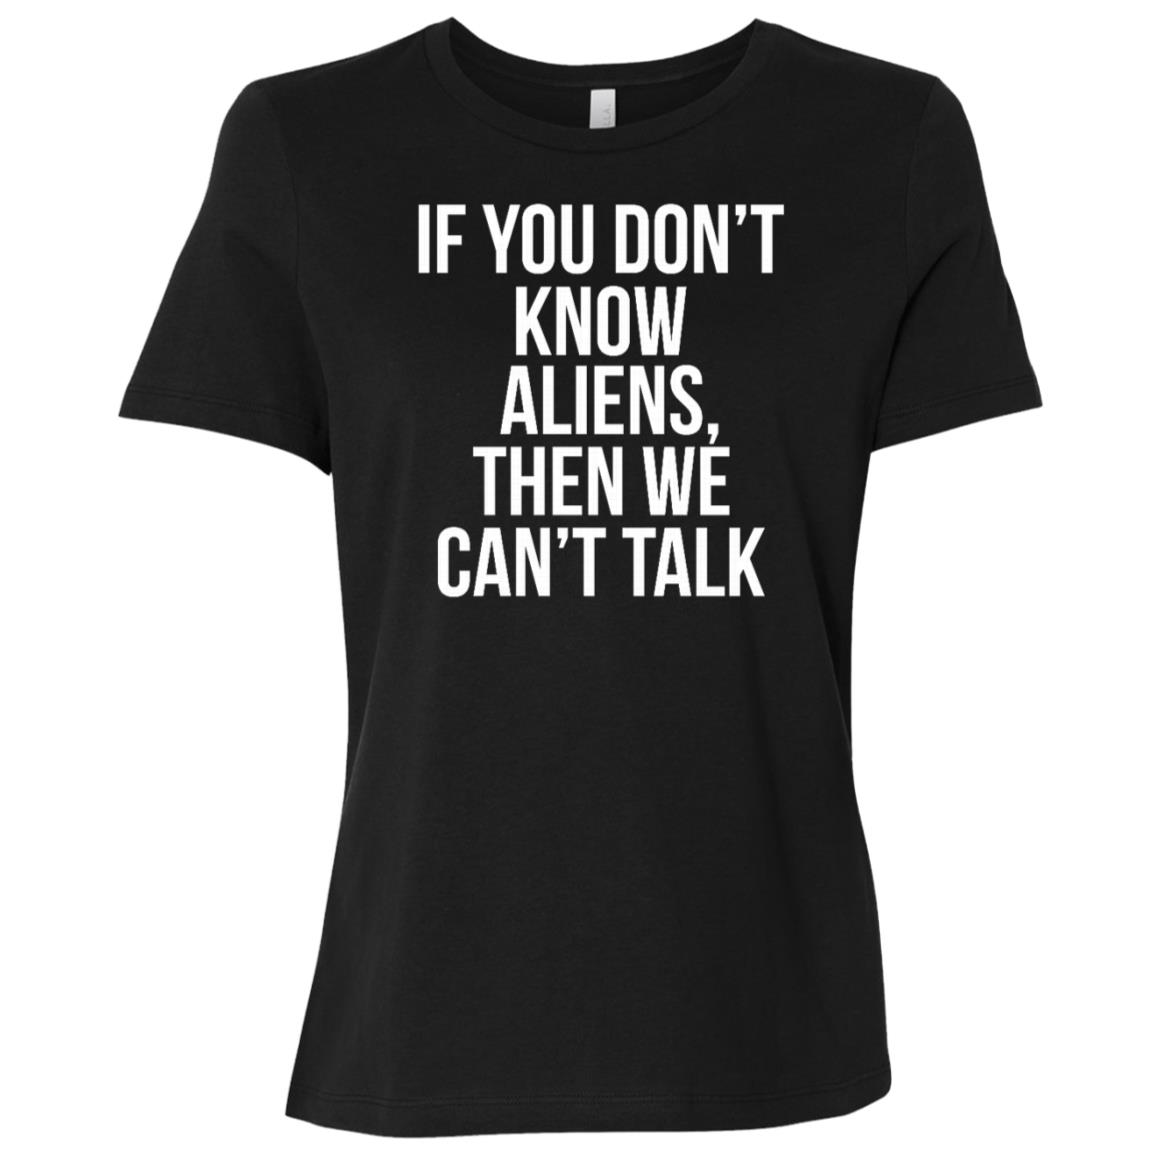 College Aliens Boys Girls Kids Women Short Sleeve T-Shirt